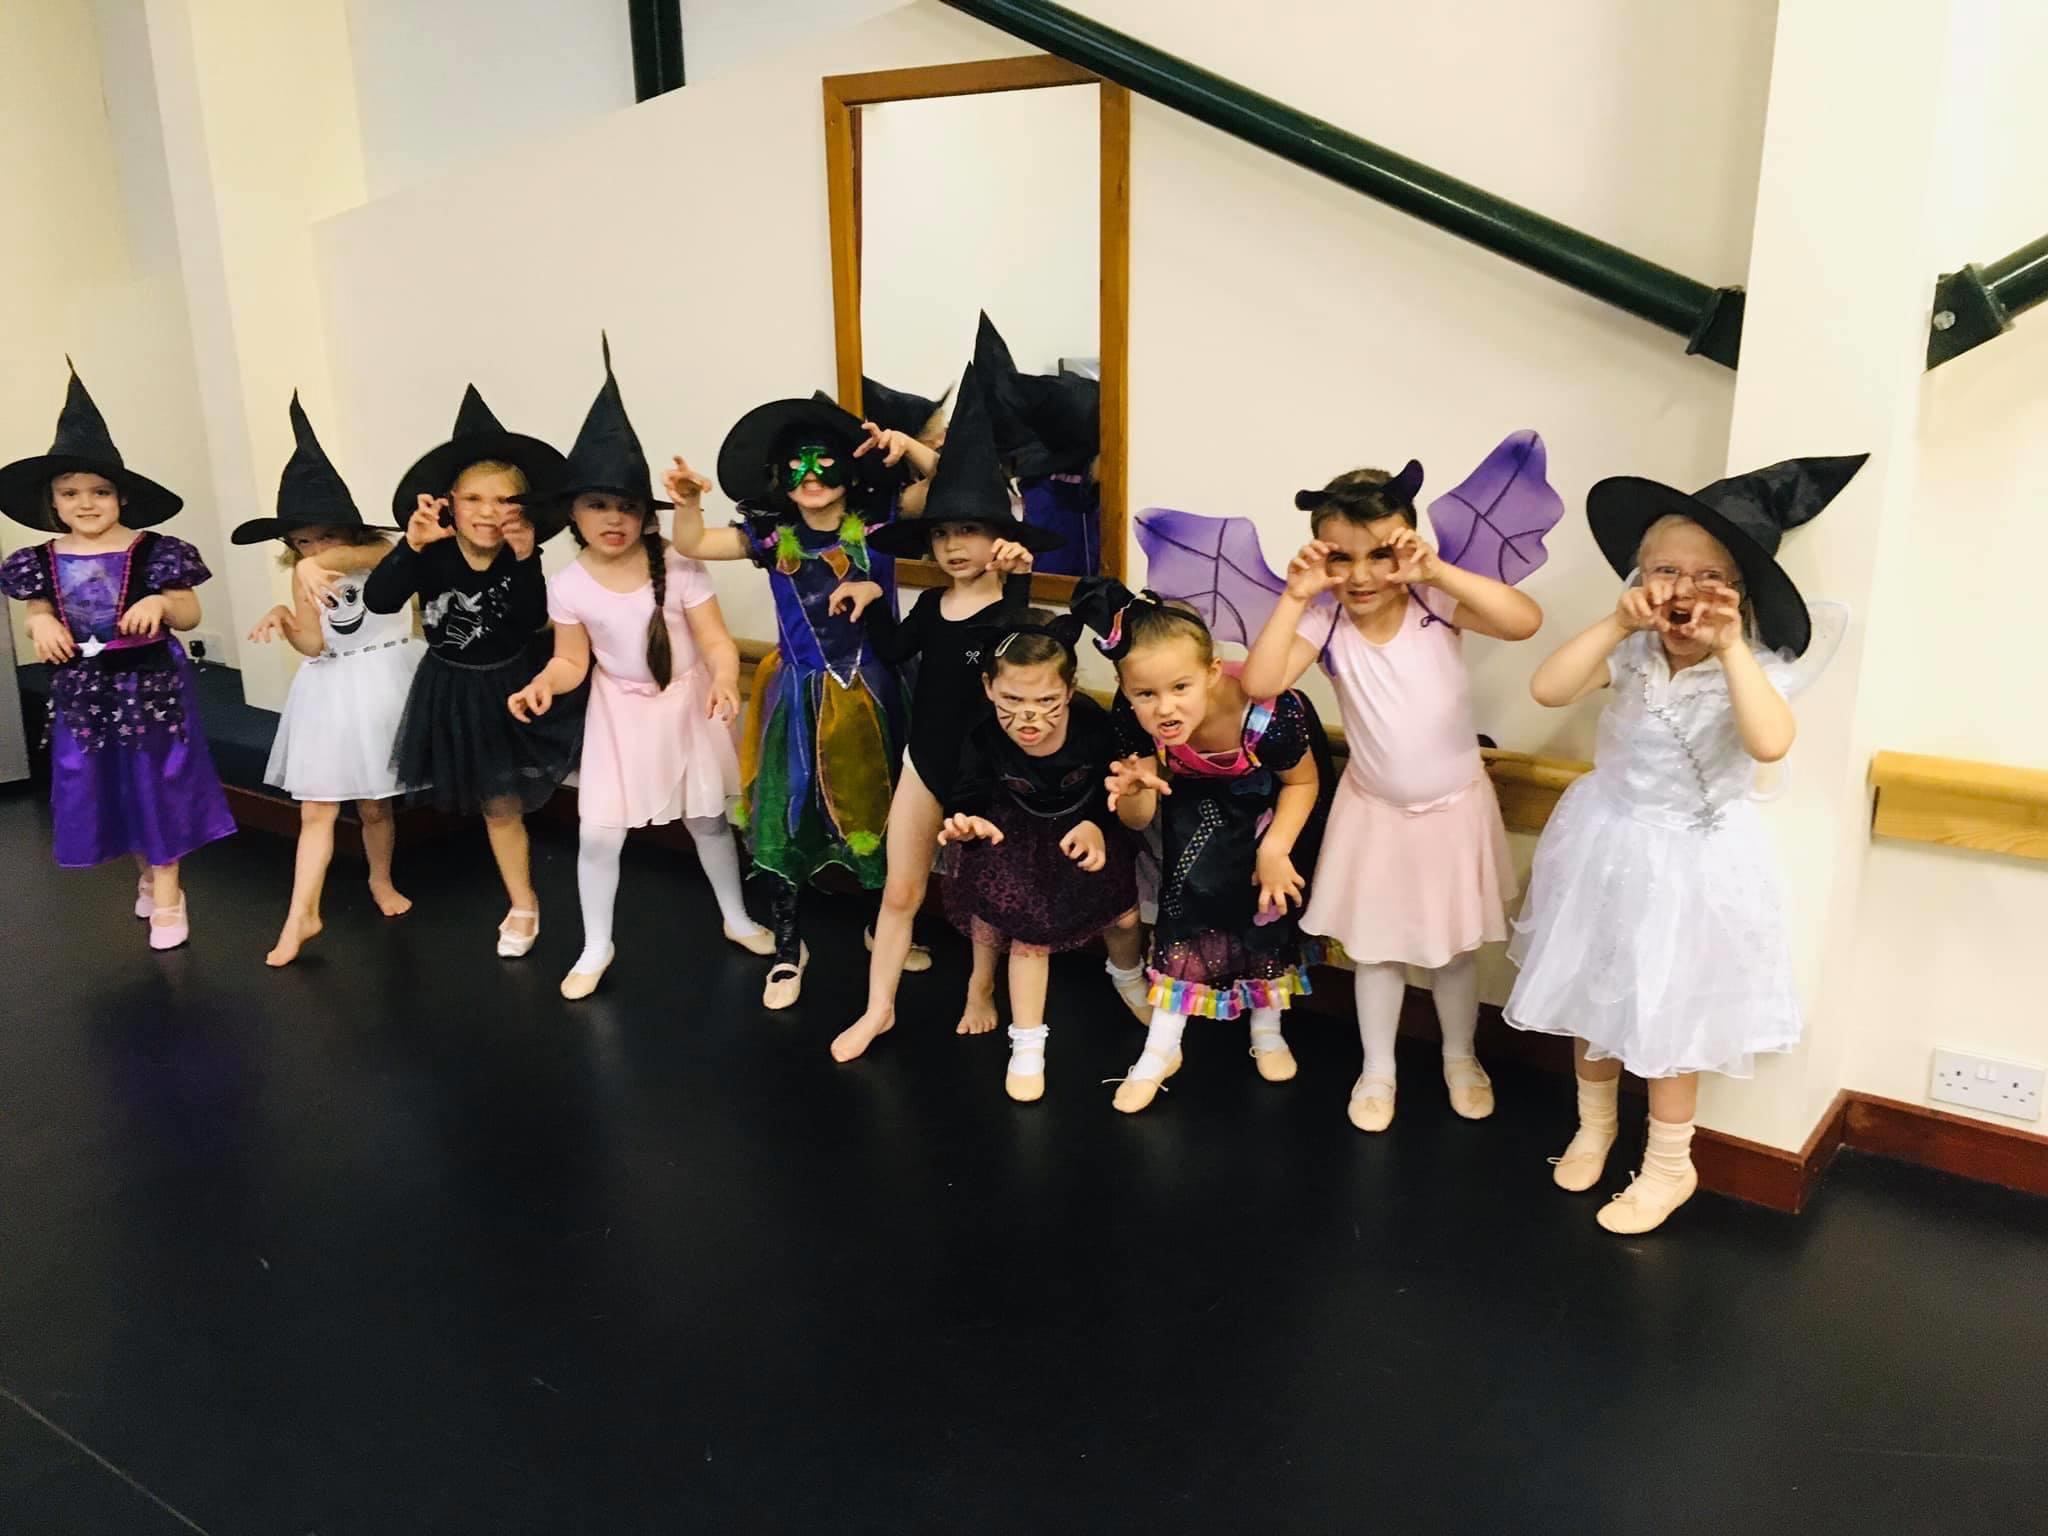 ballet class dressed for halloween